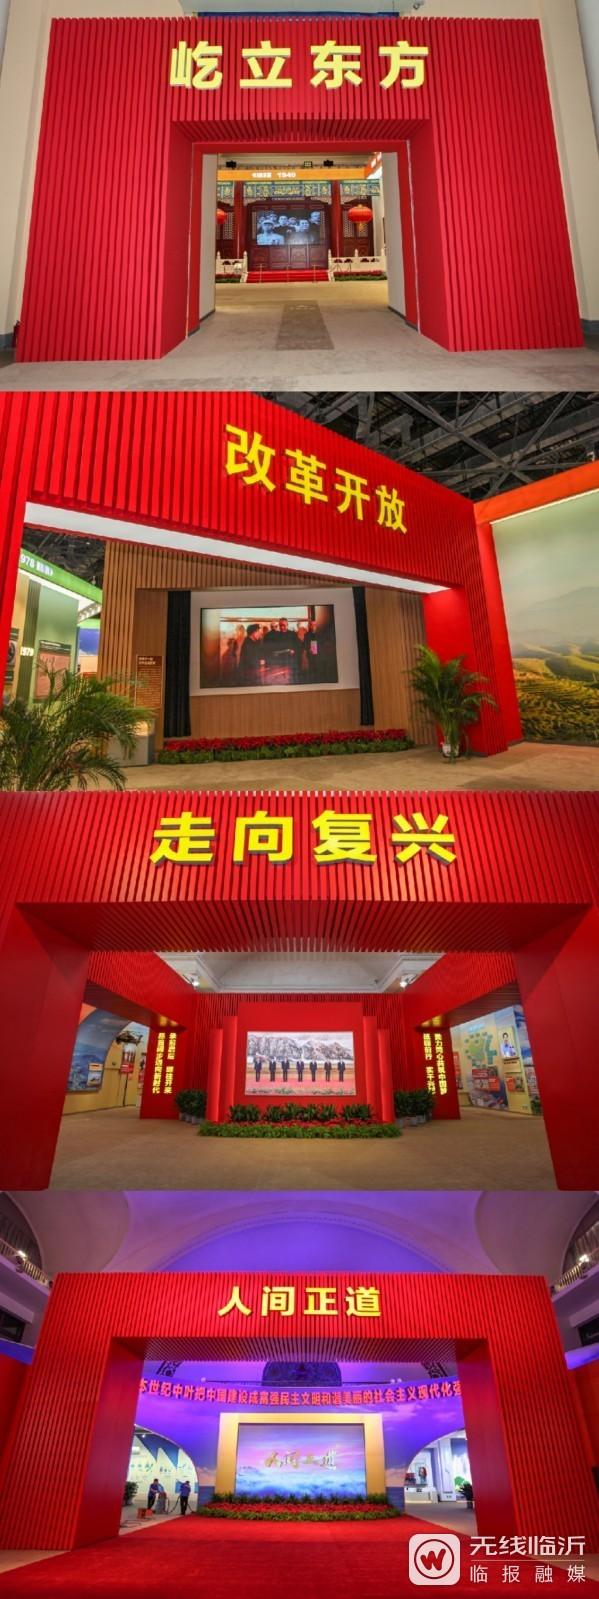 "conew_2019年""伟大历程 辉煌成就——庆祝中华人民共和国成立70周年大型成就展""照片 (7).jpg"